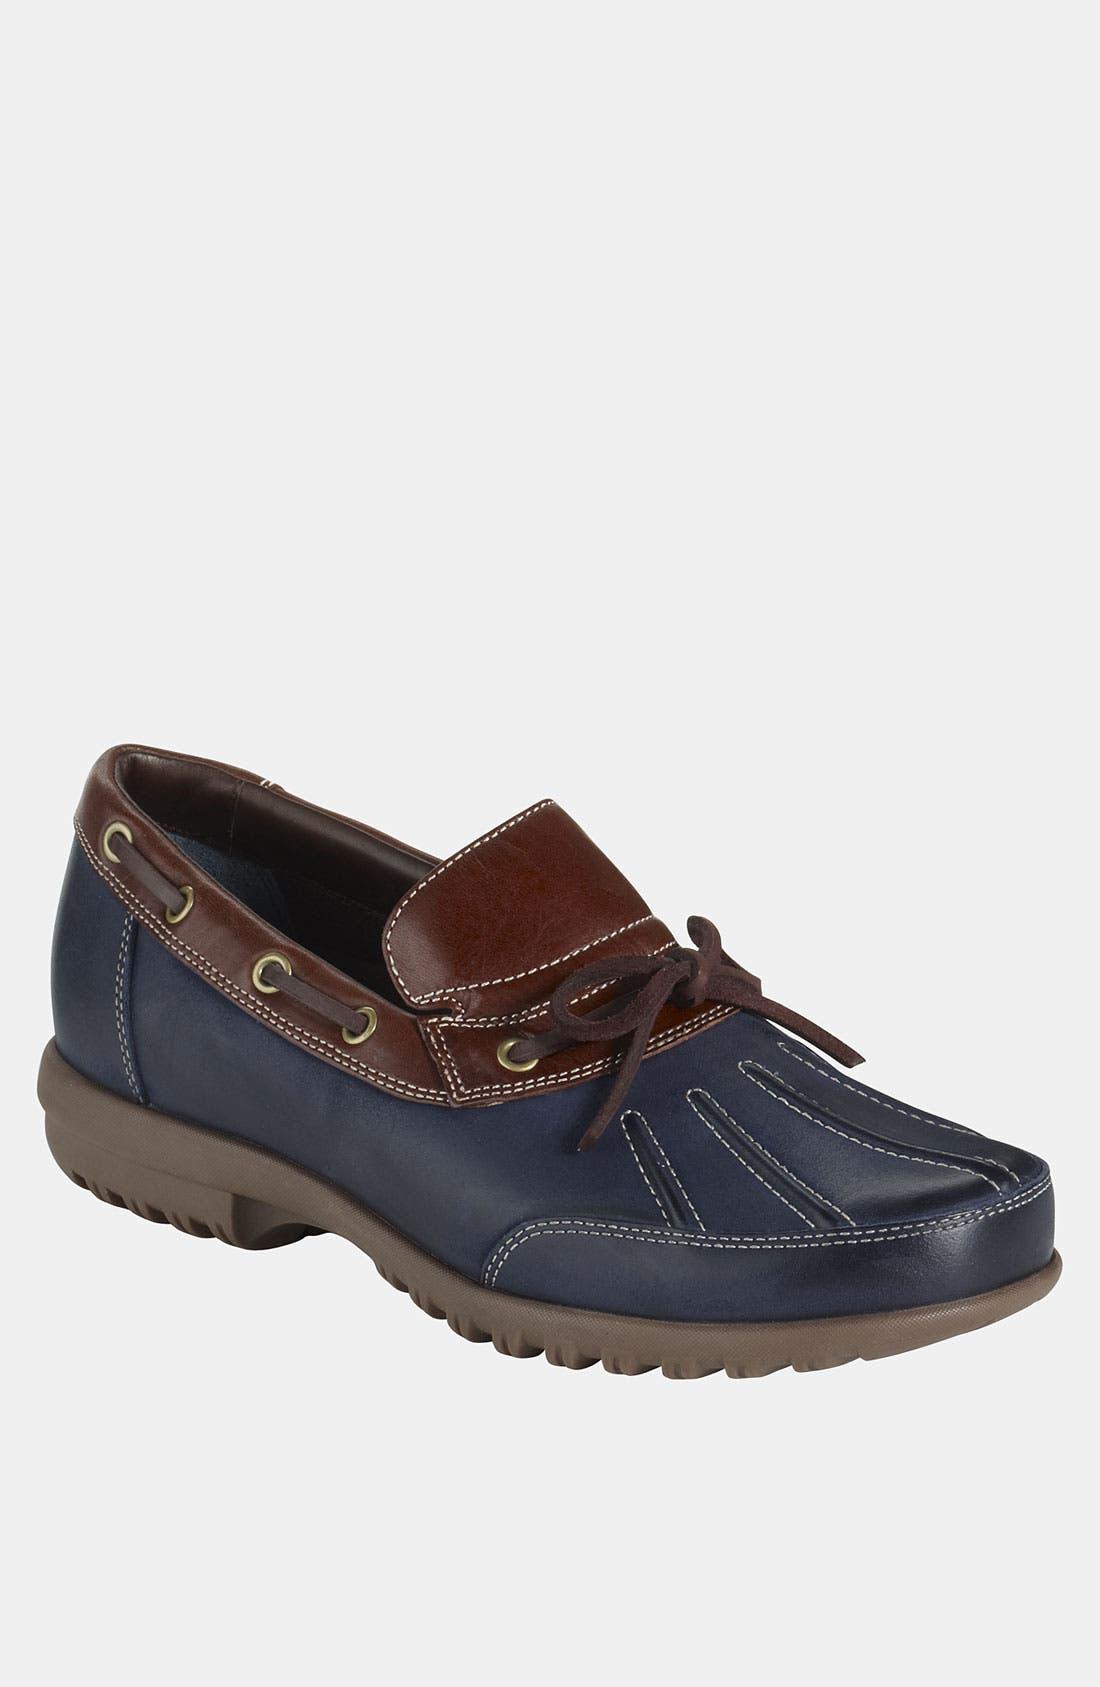 Alternate Image 1 Selected - Cole Haan 'Air Rhone' Camp Boat Shoe